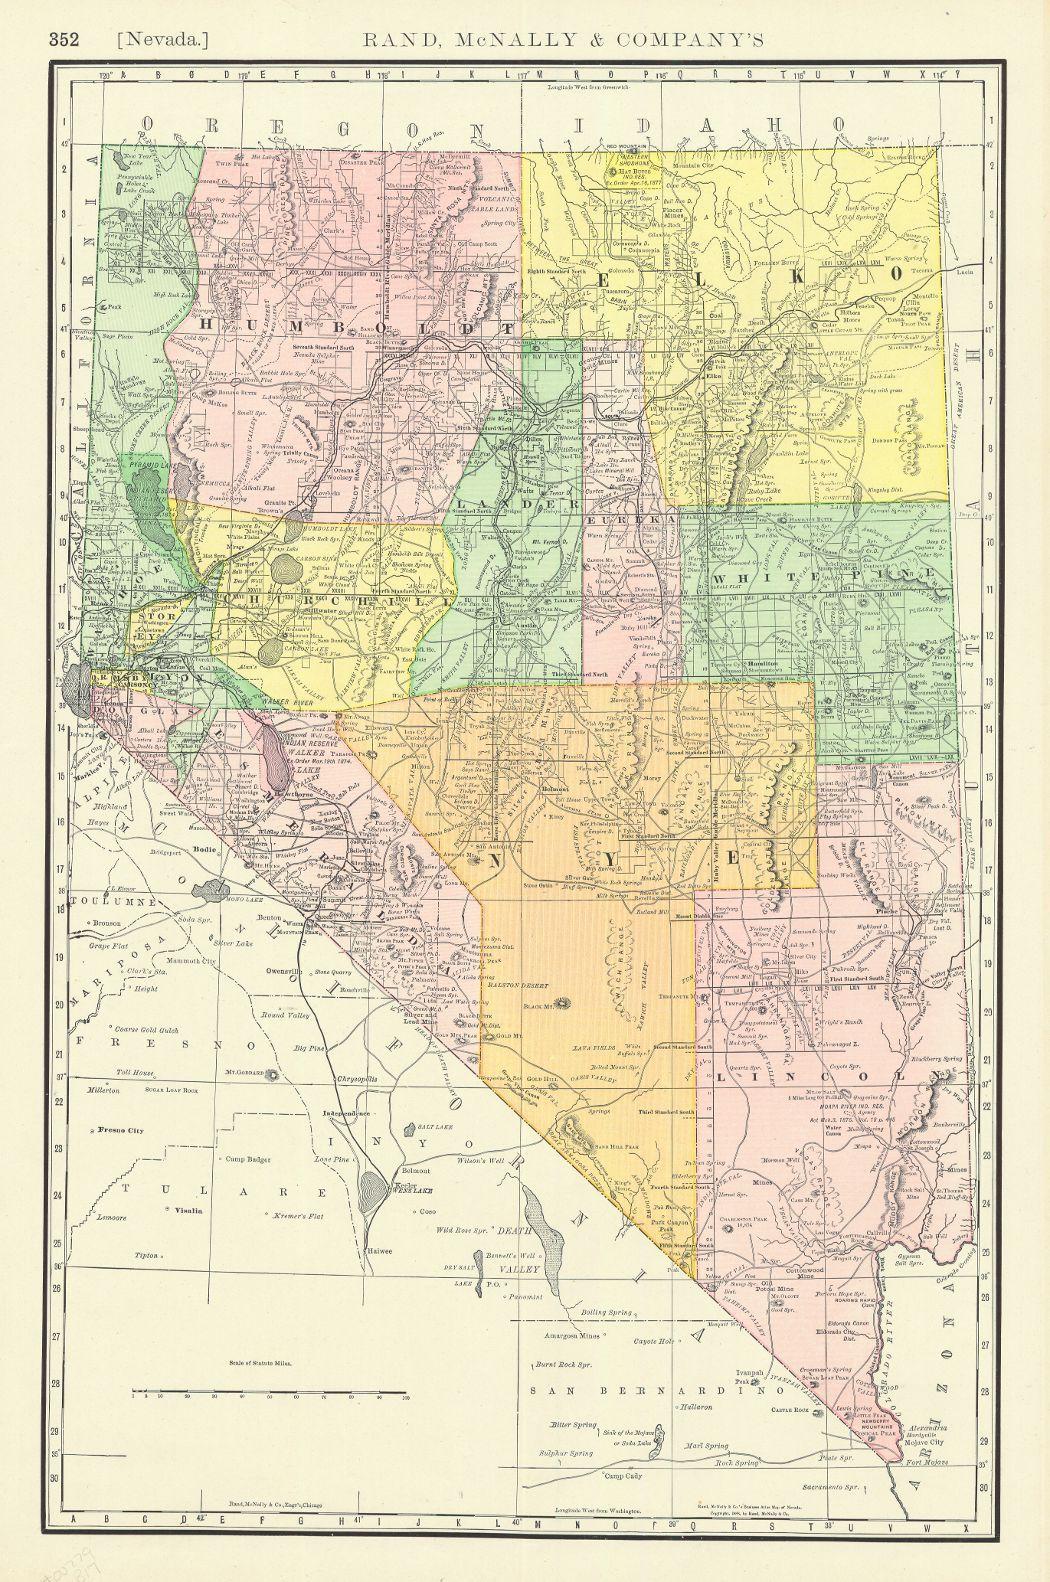 Nevada Rand McNally Co Map With Counties Separately - Rand macnally southwestern us road map